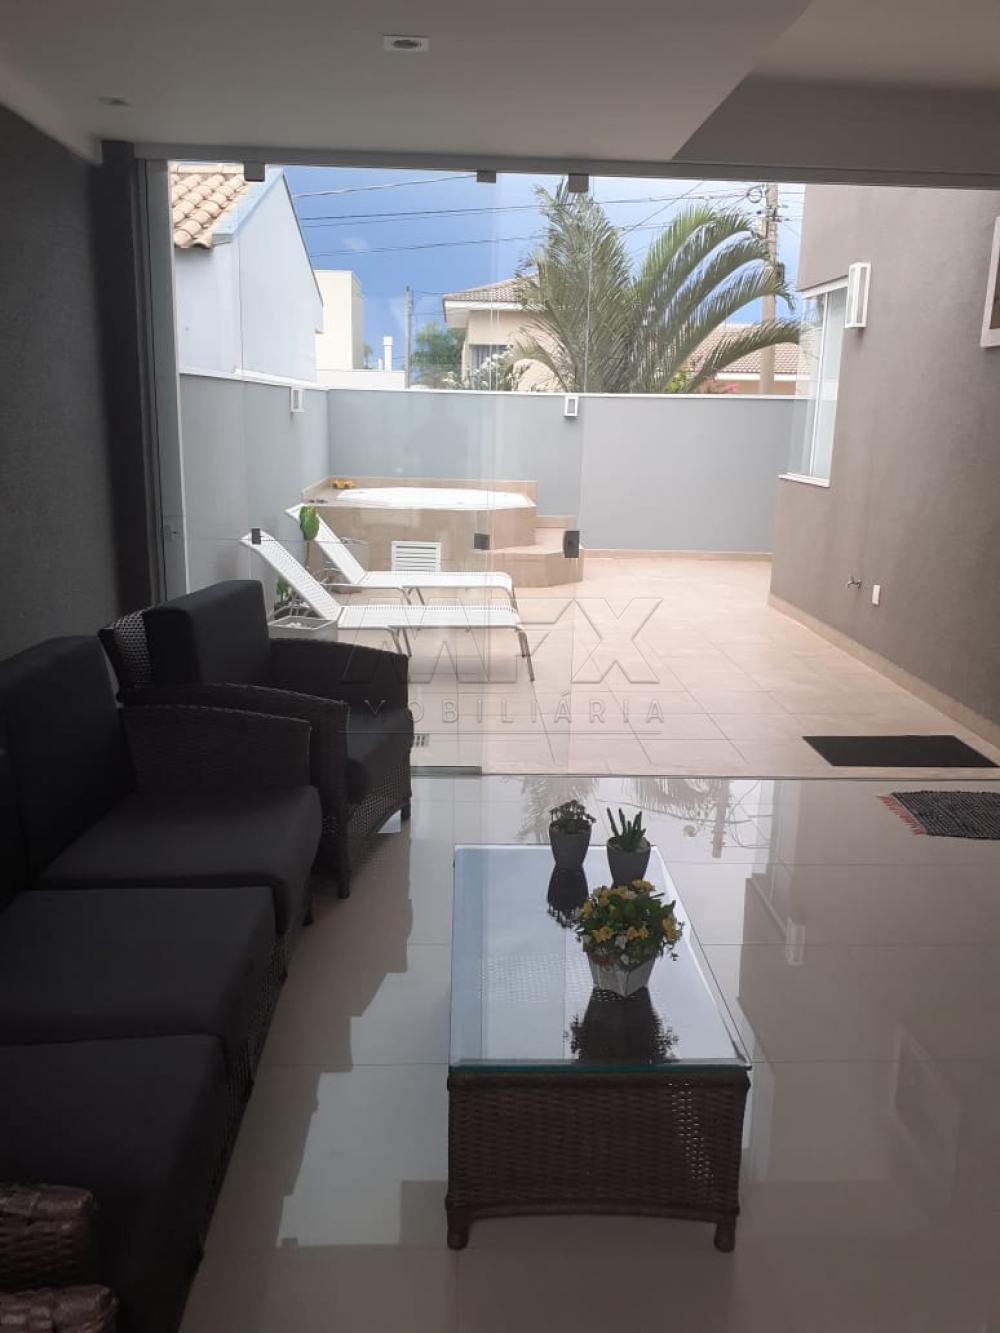 Comprar Casa / Condomínio em Bauru R$ 1.900.000,00 - Foto 15